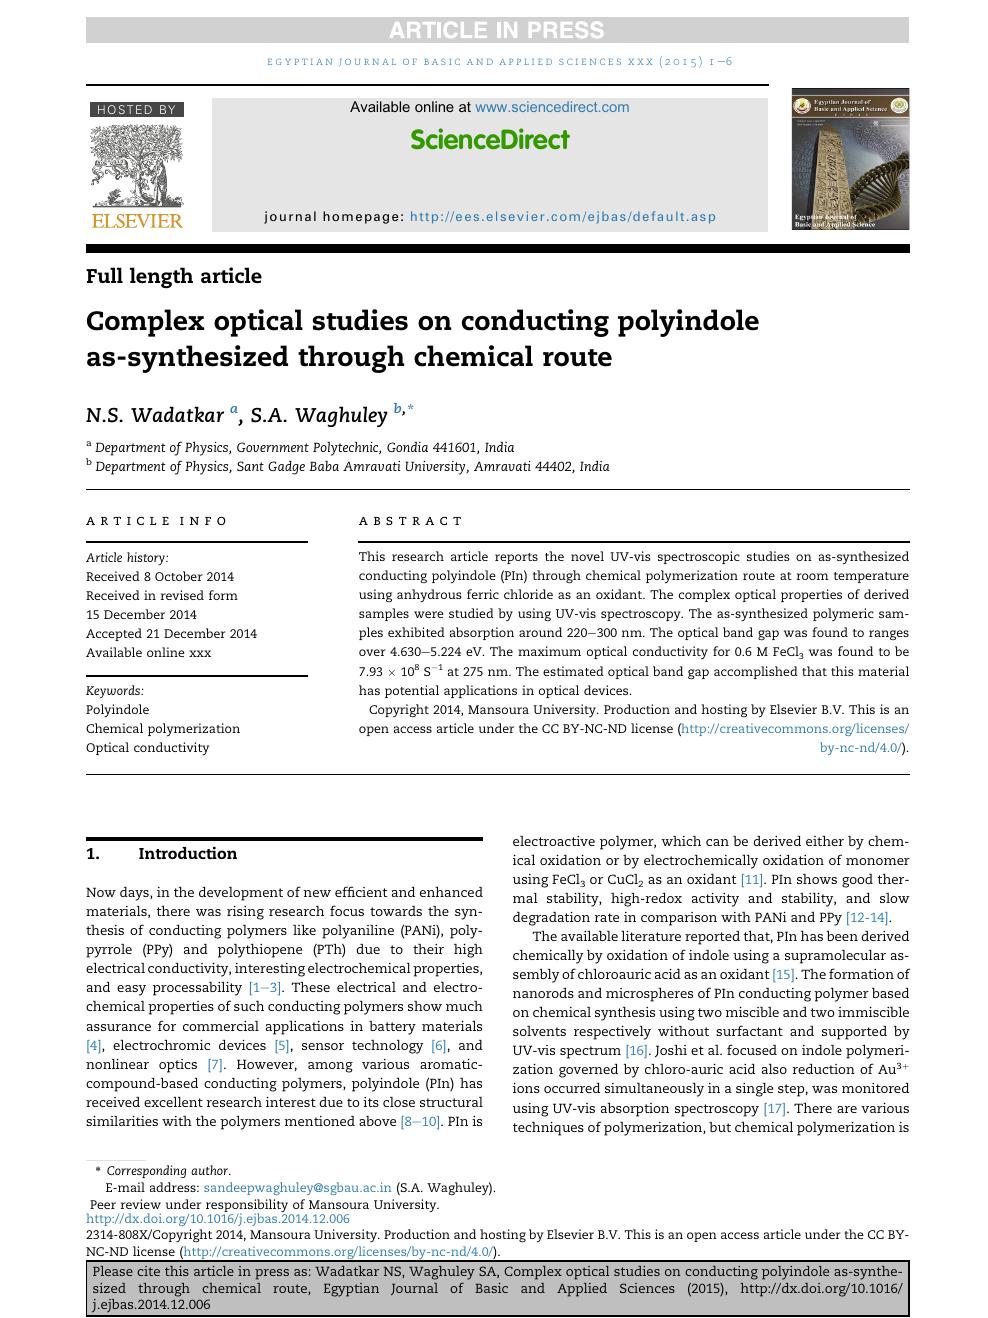 Complex optical studies on conducting polyindole as